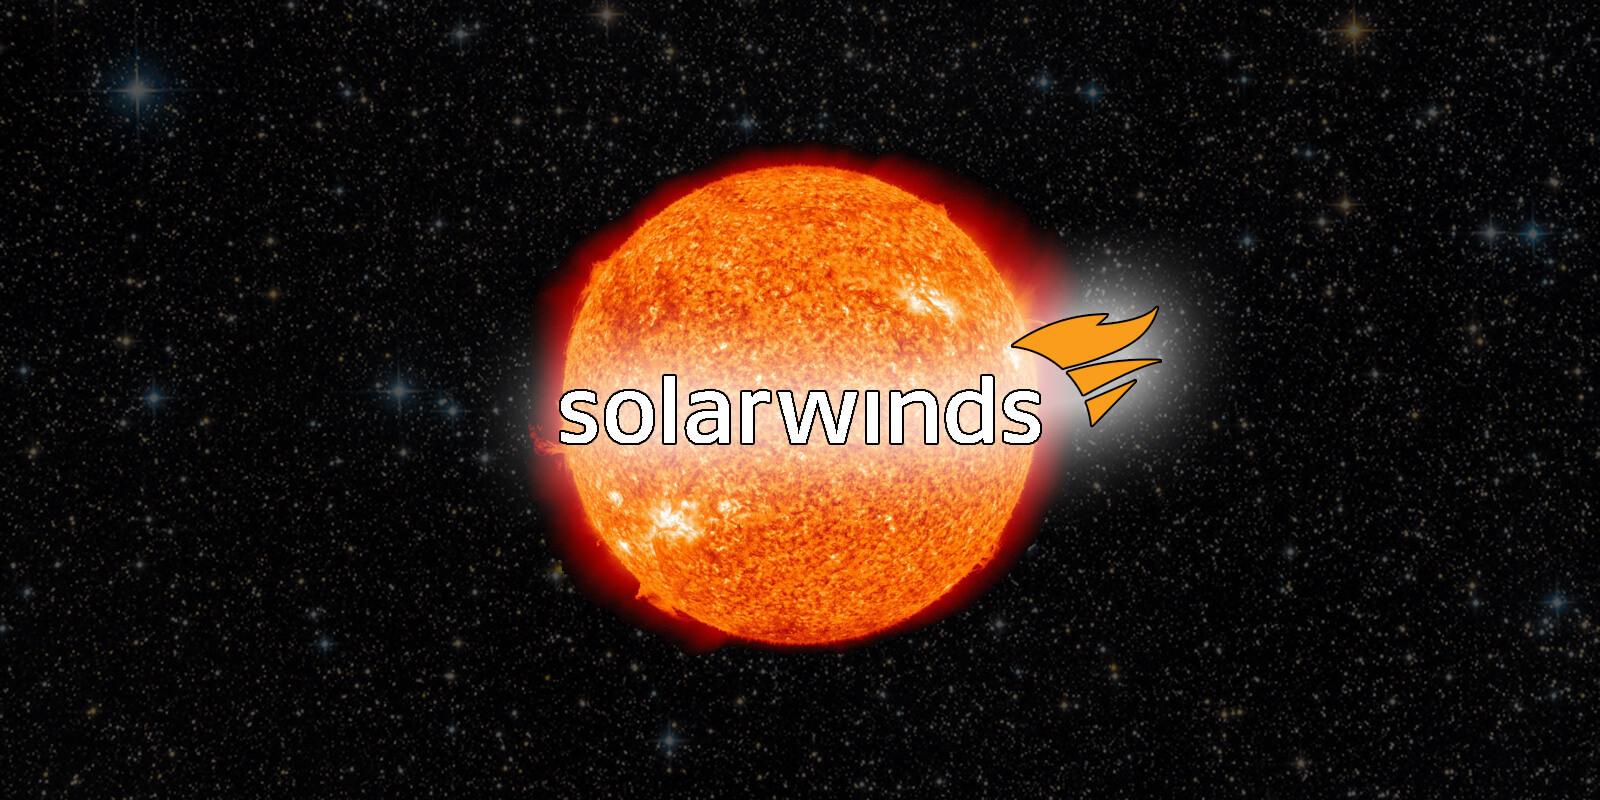 SolarWinds releases updated advisory for new SUPERNOVA malware